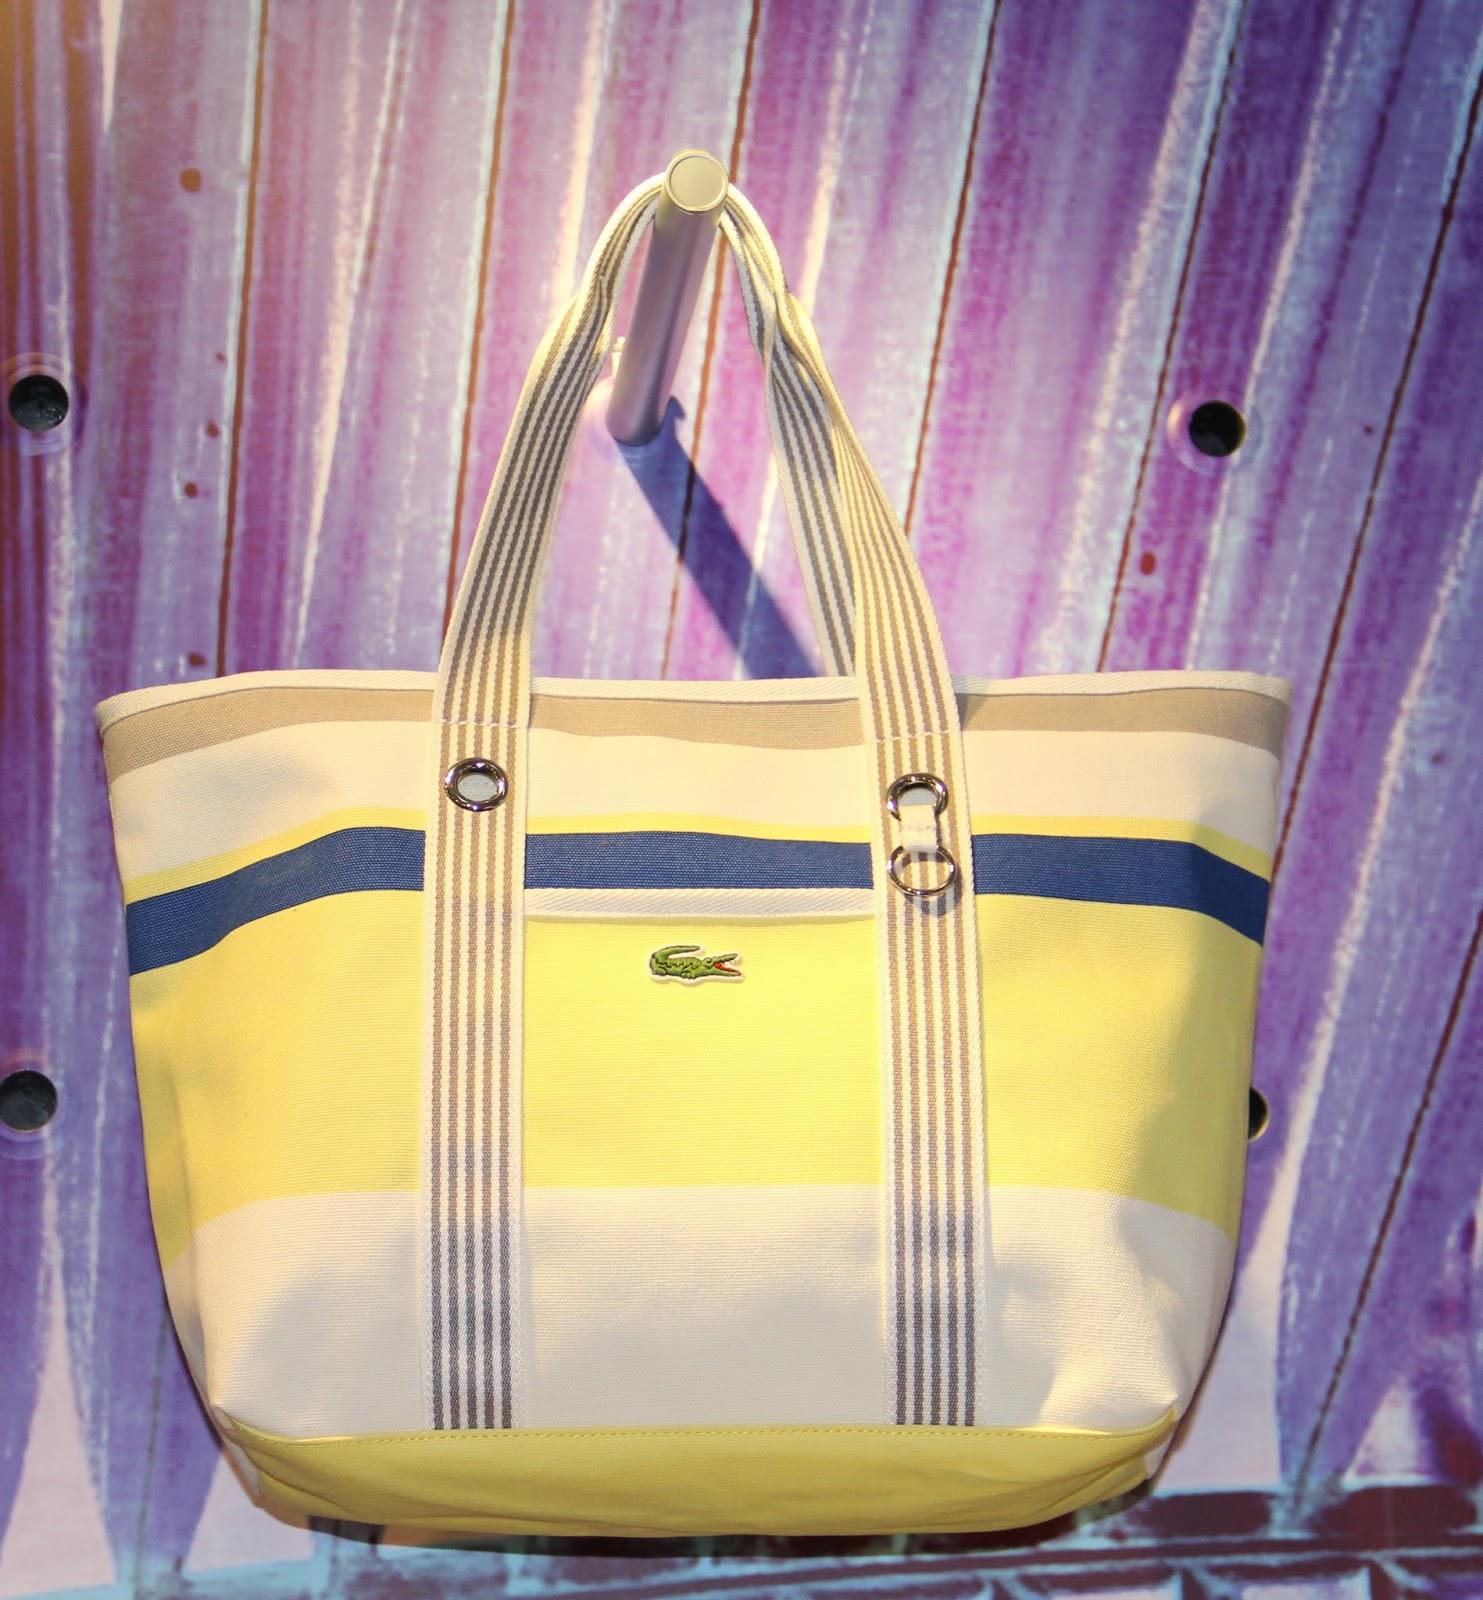 Lacoste Live Footwear Apparel Accessories Plus Peter Espro Madison Shoulder Handbag Navy Canvas Tote Shopperhardware Details Reminds Us Of Boat Portholes